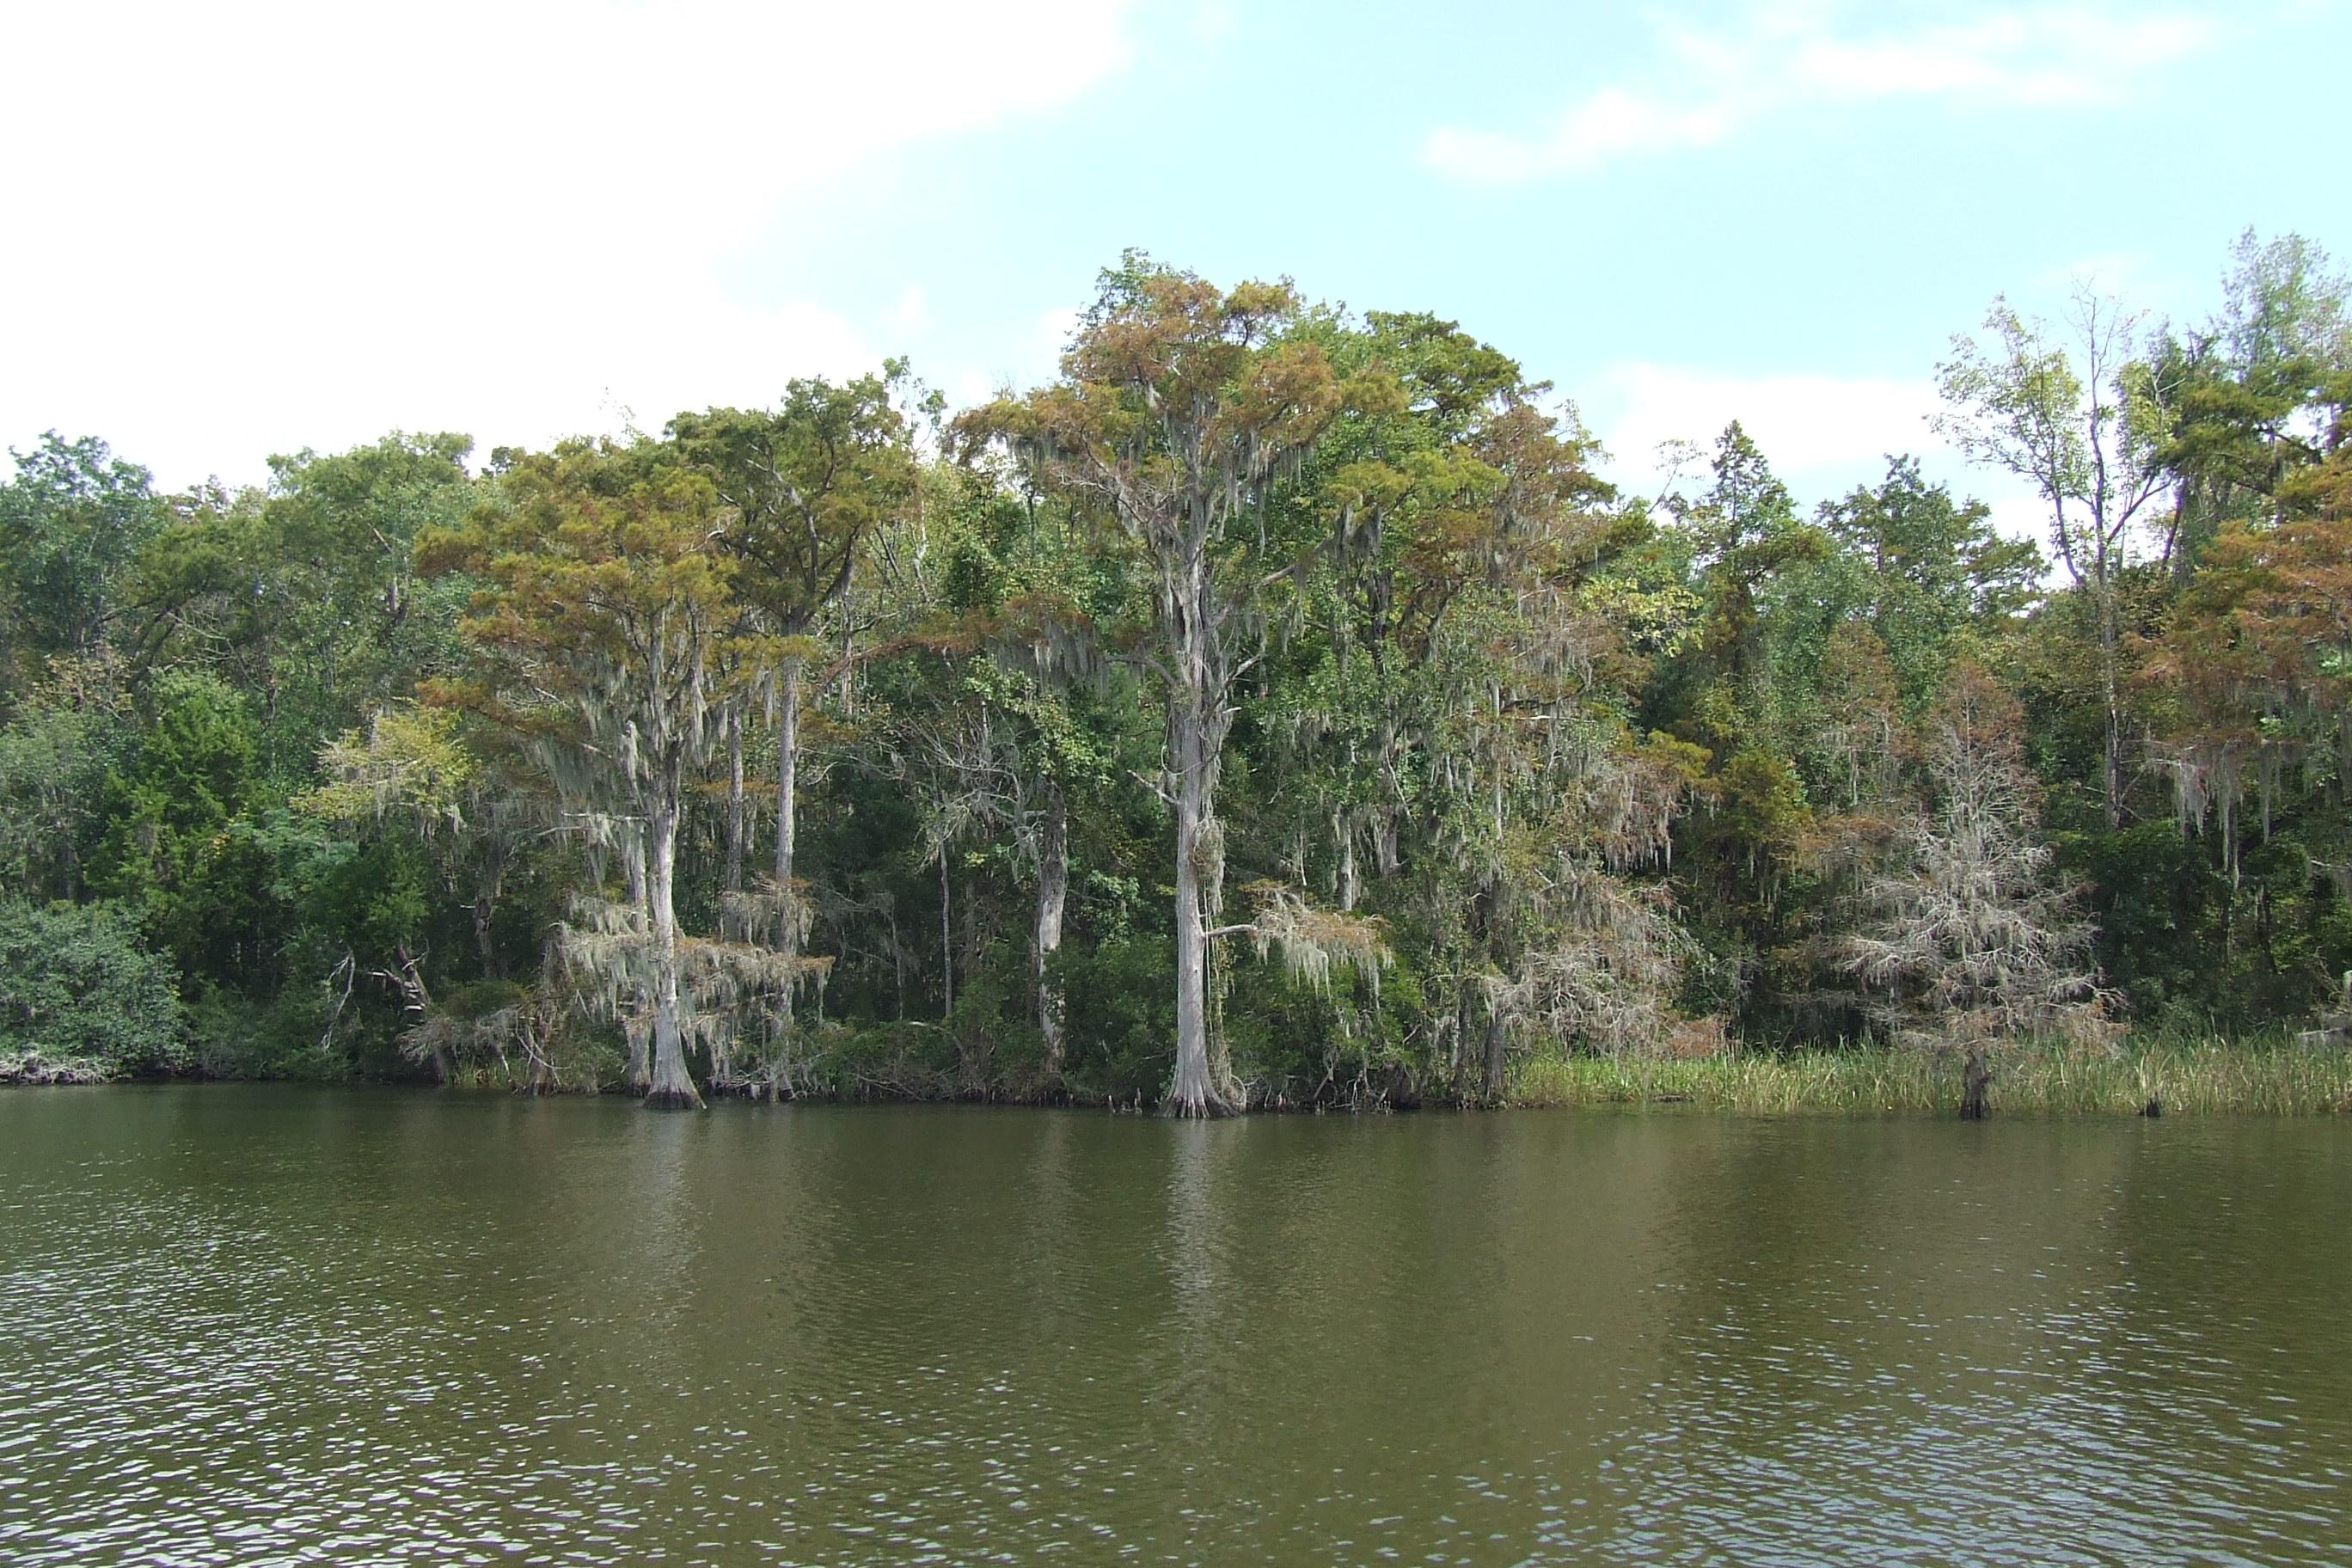 File:Delta landscape, Alabama (5984944050).jpg - Wikimedia